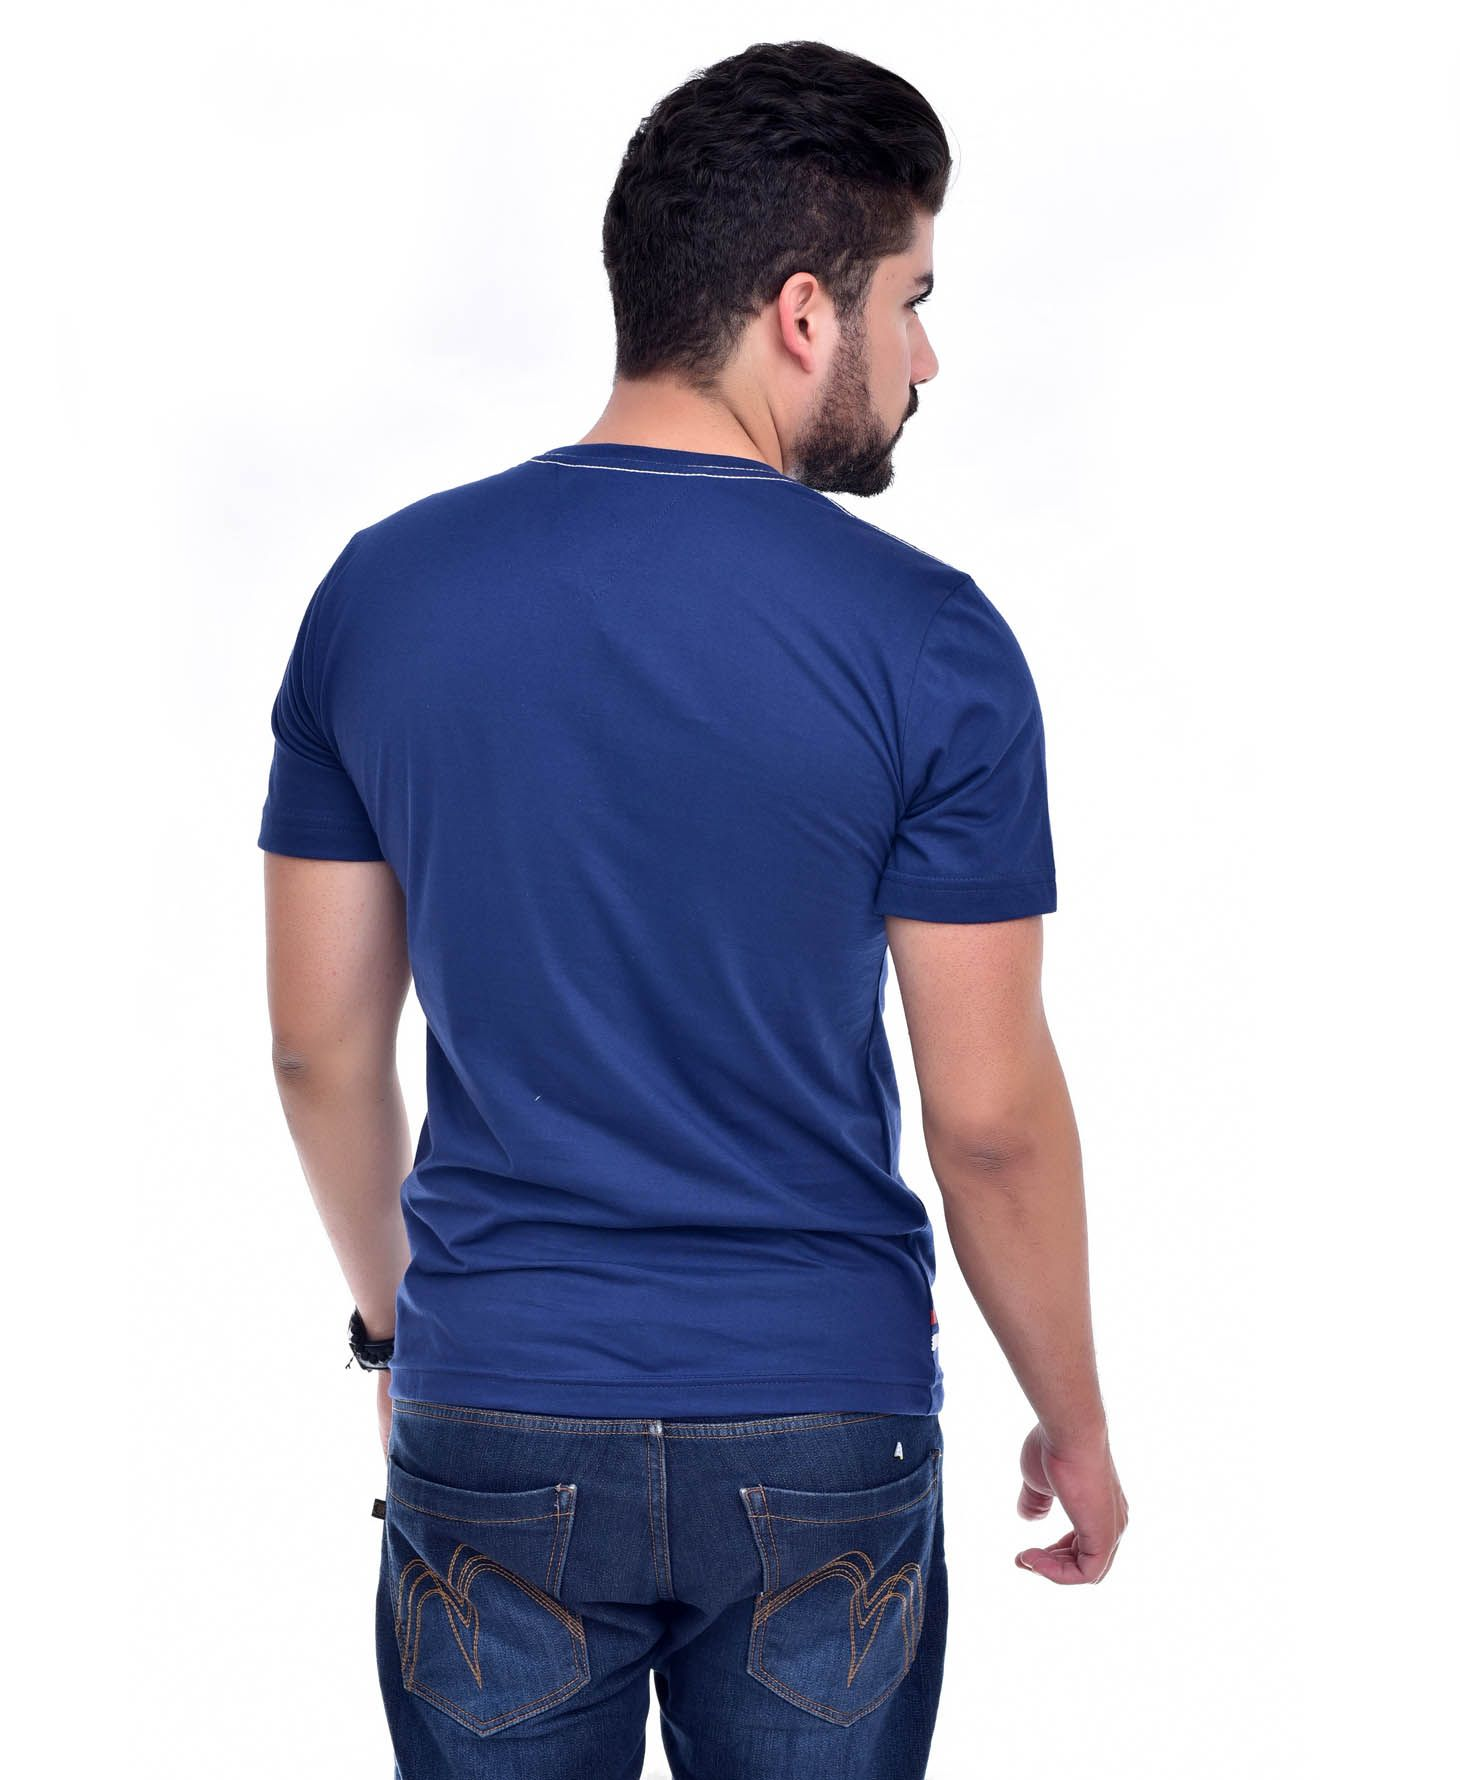 Camiseta TH Big T Marinho  - Ca Brasileira